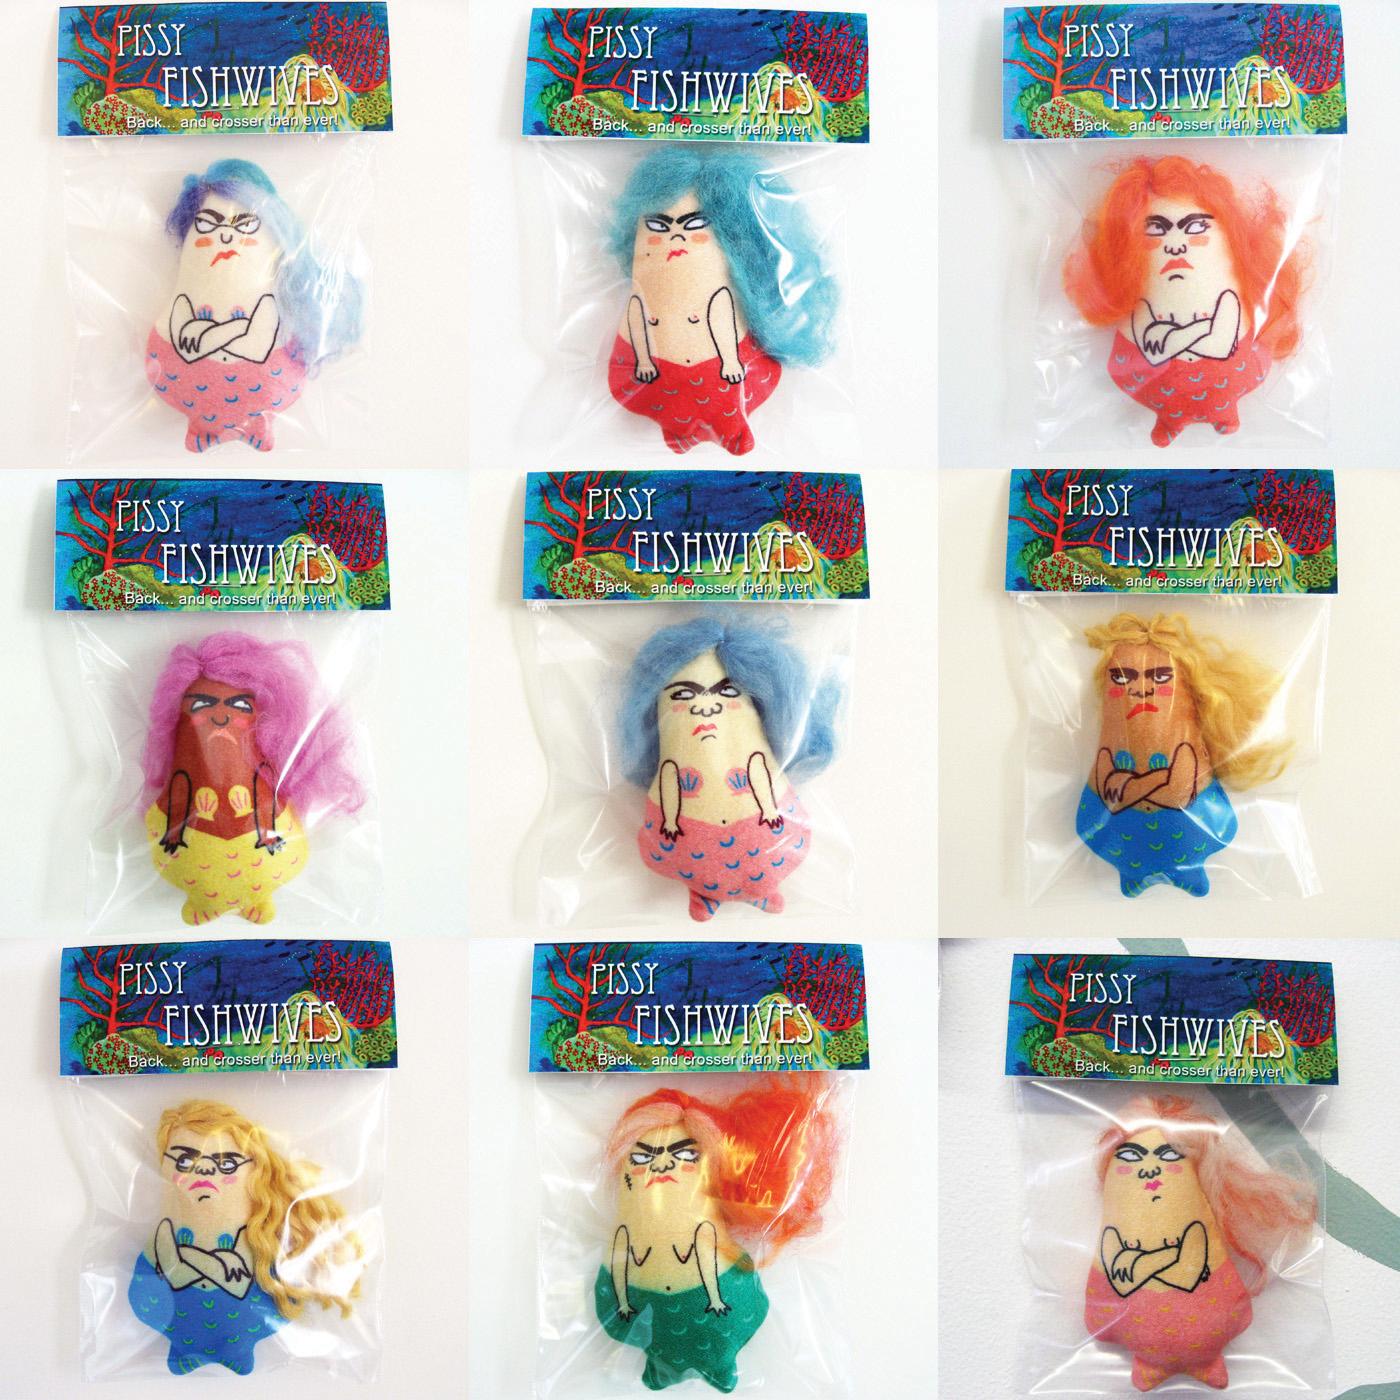 Pissy Fishwife dolls